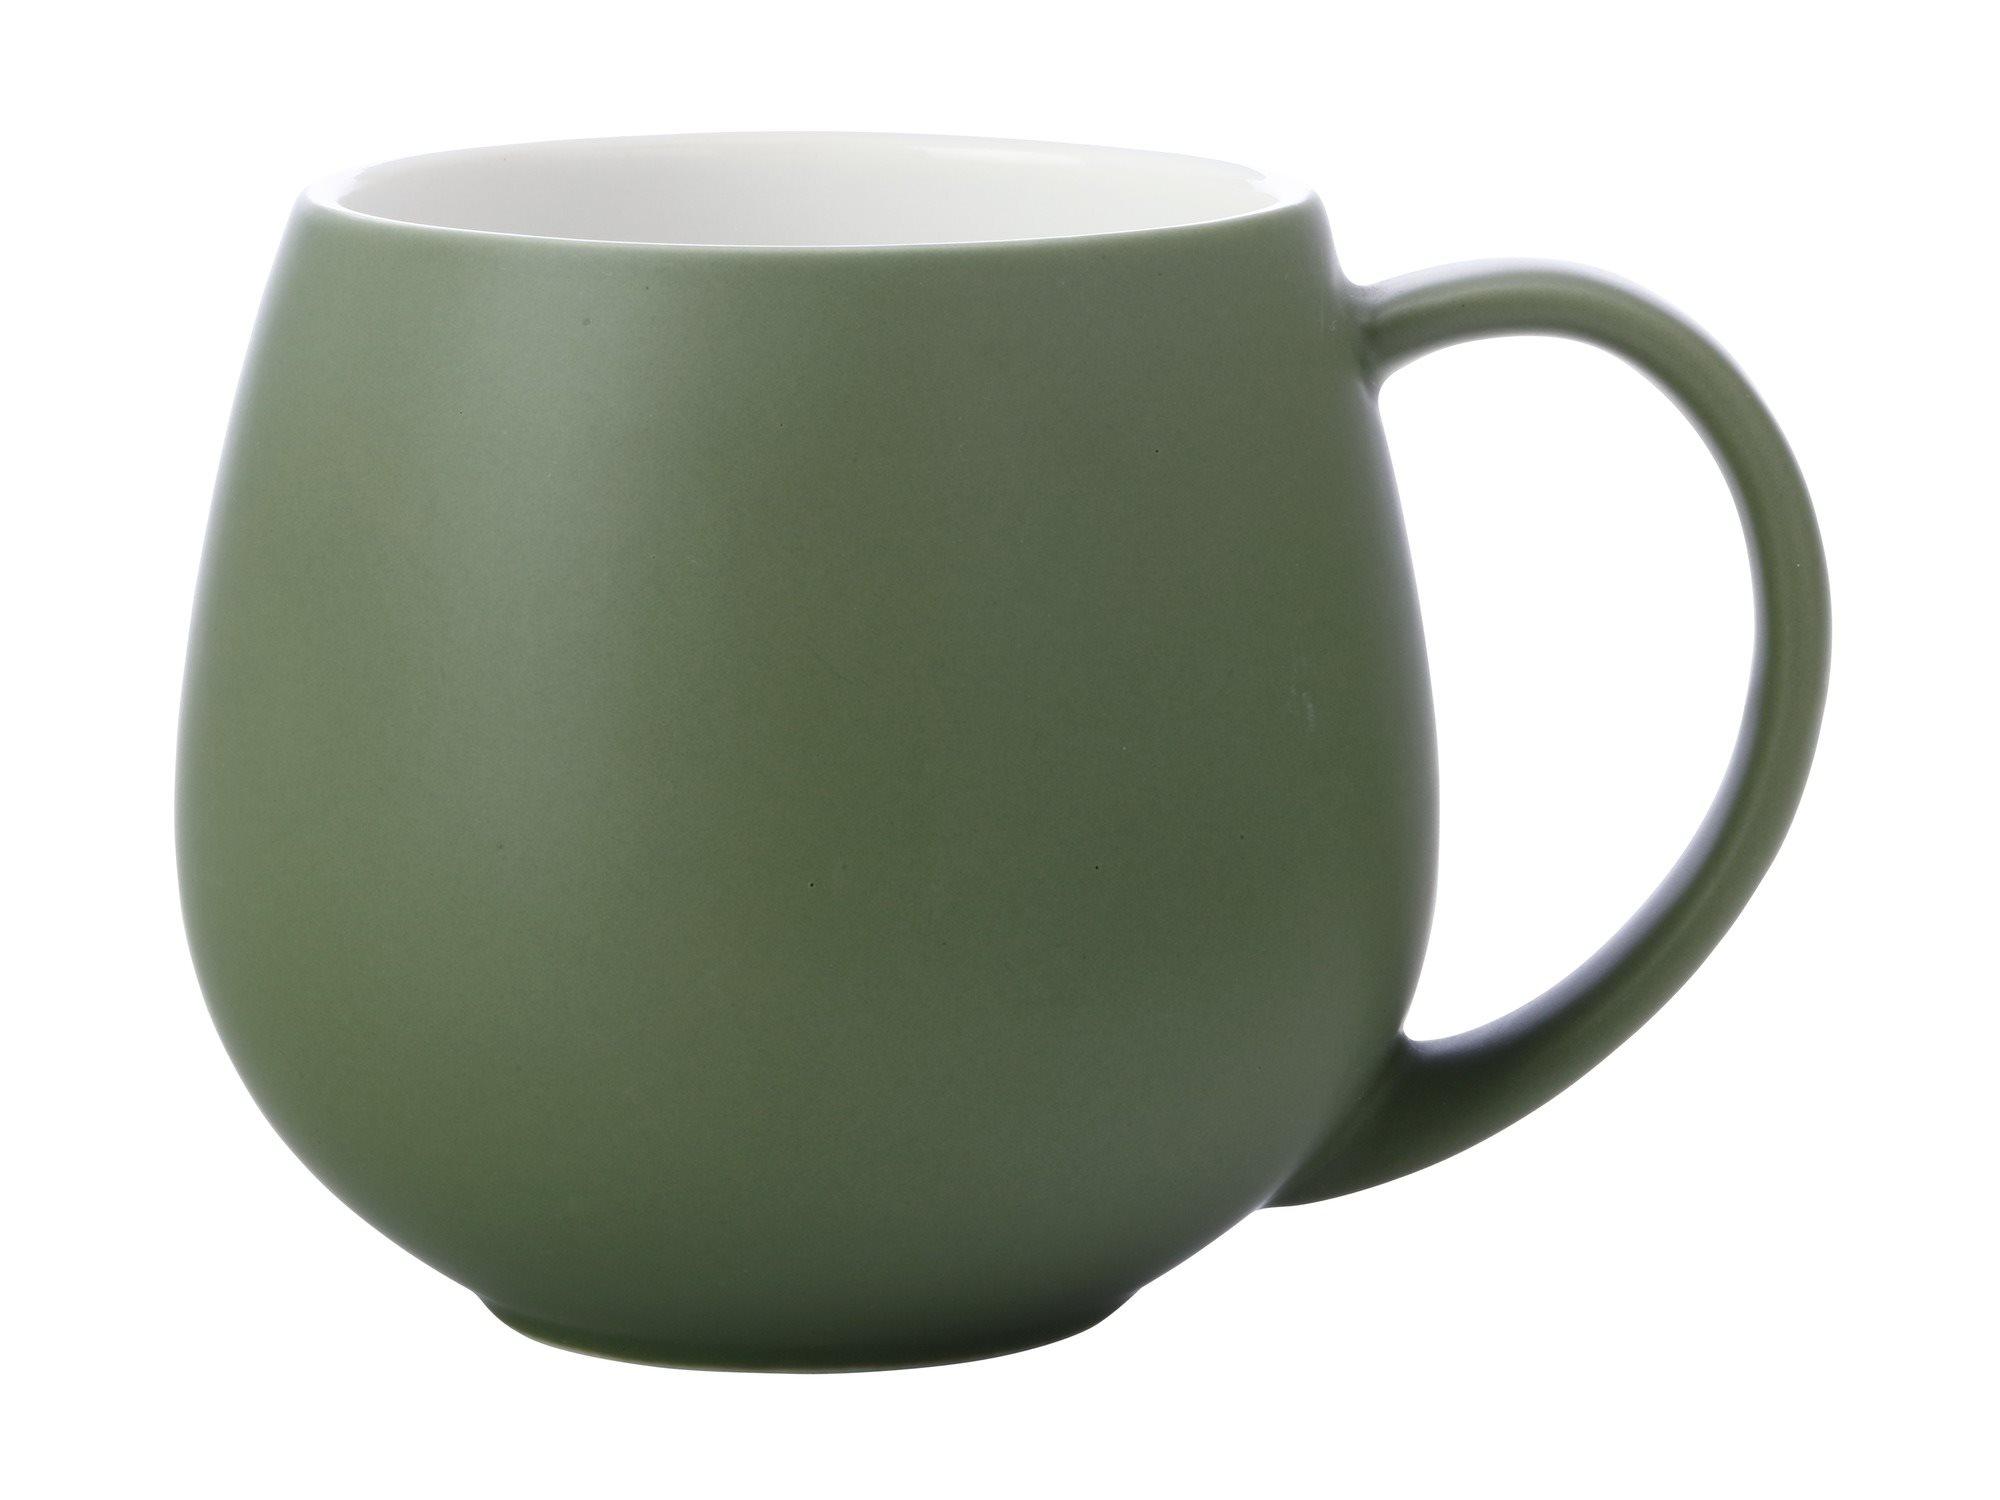 Maxwell & Williams Κούπα Snug Πράσινη Tint 450ml AY0417